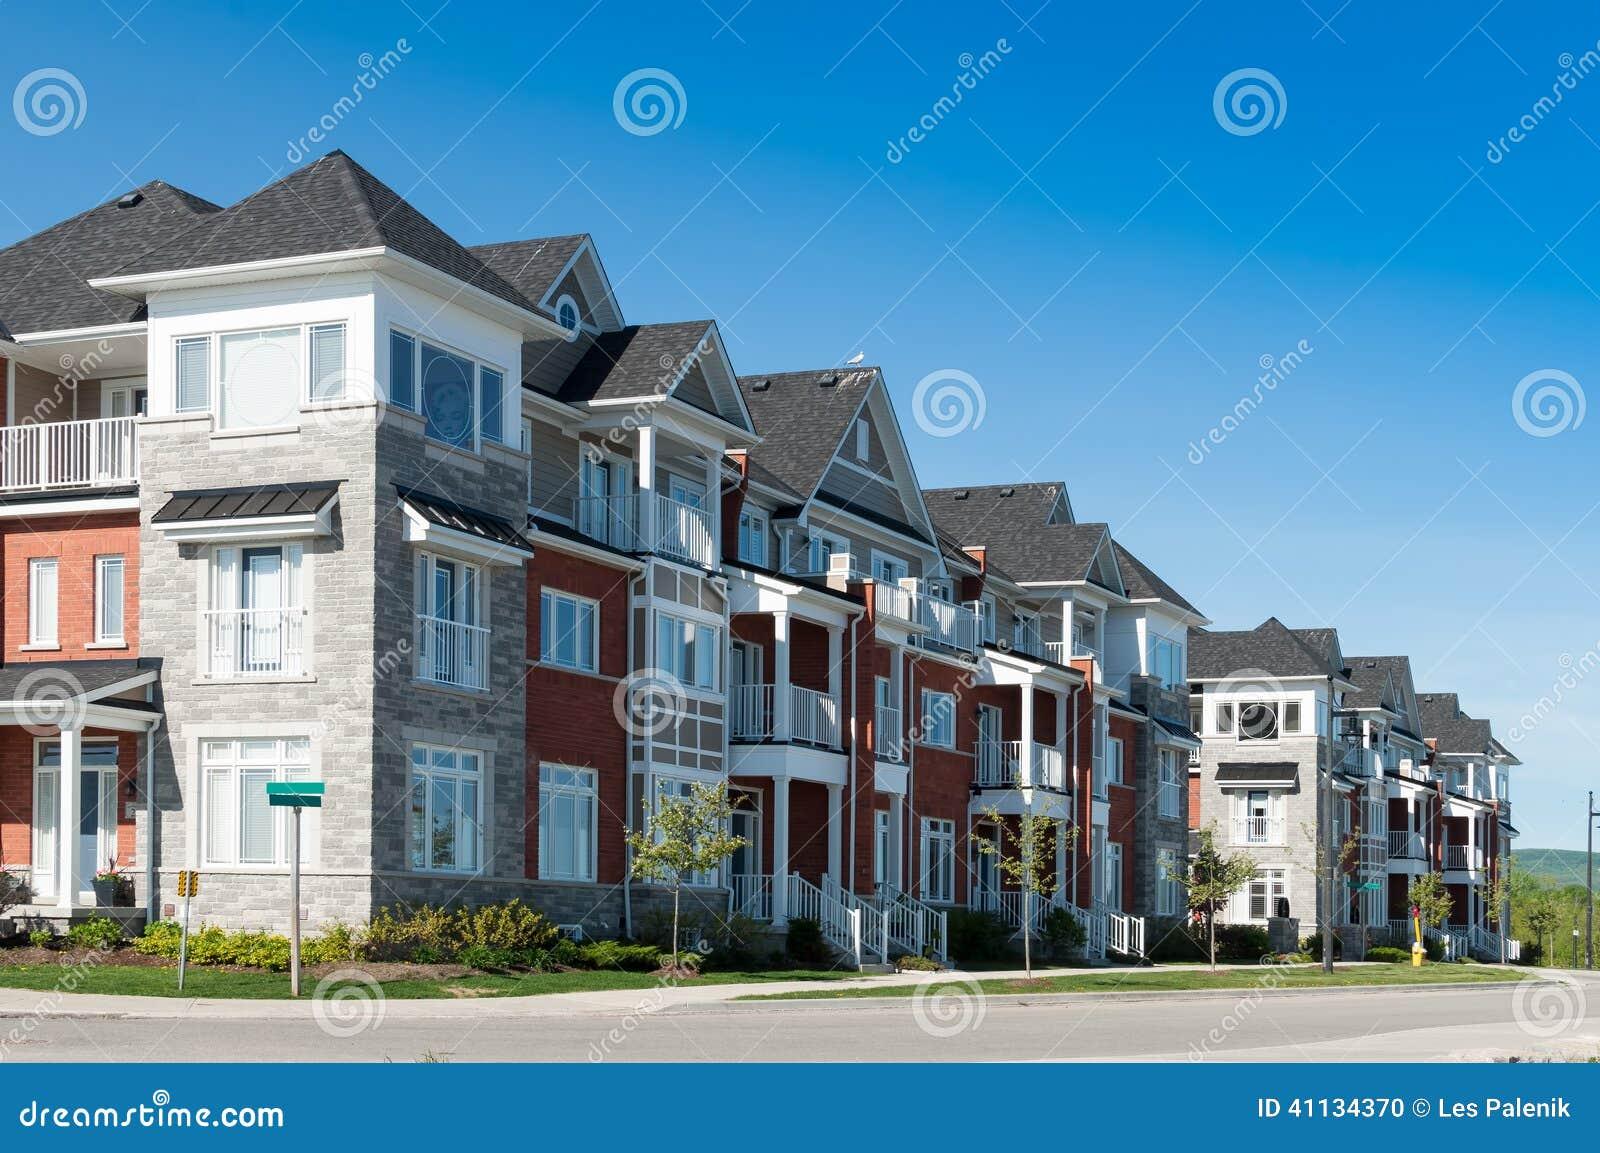 Attractive apartment buildings